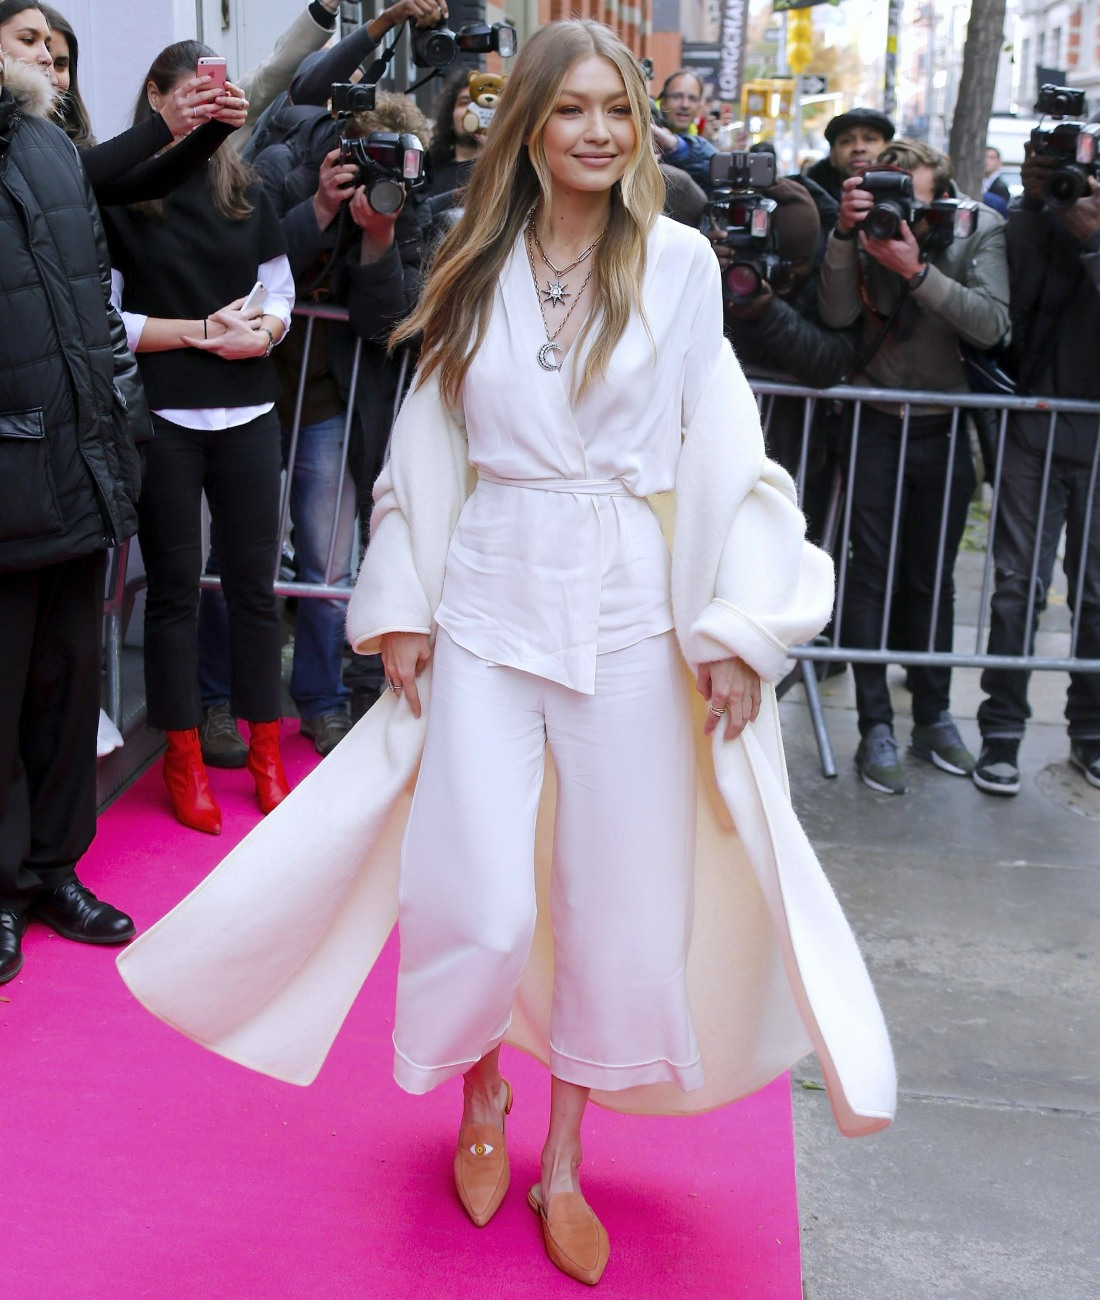 Model Gigi Hadid is seen arriving at Stuart Weitzman